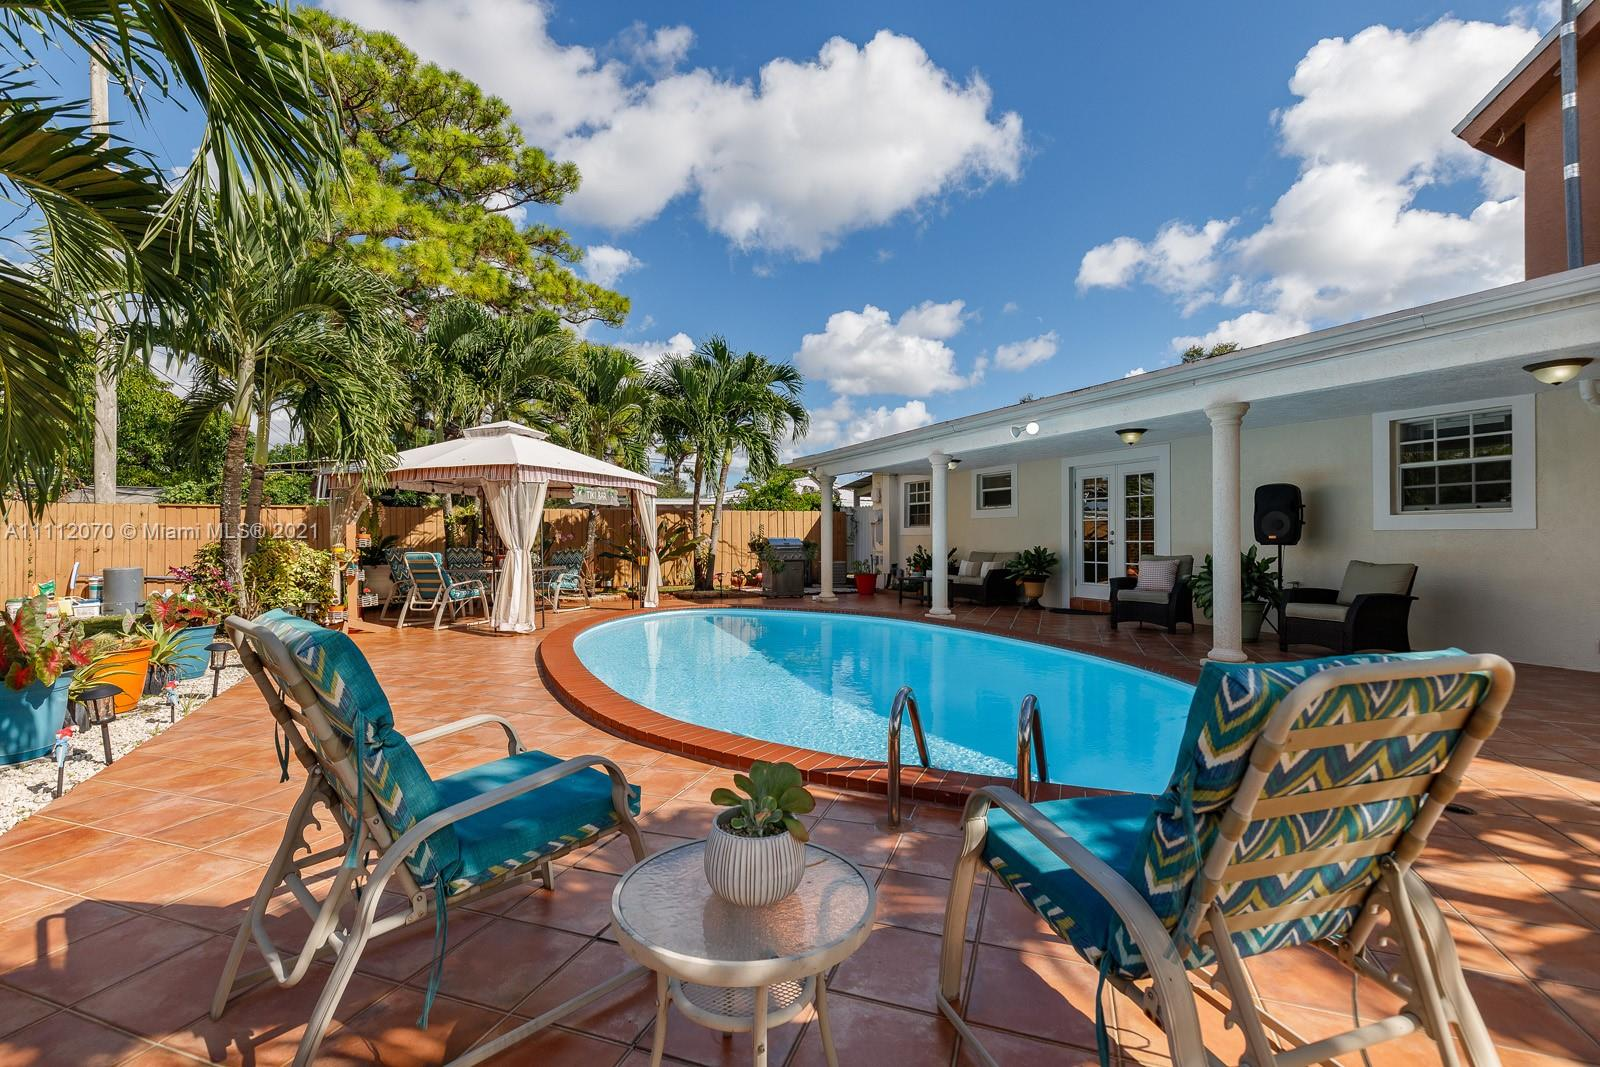 Single Family Home For Sale BONNIE BRIAR ESTATES2,068 Sqft